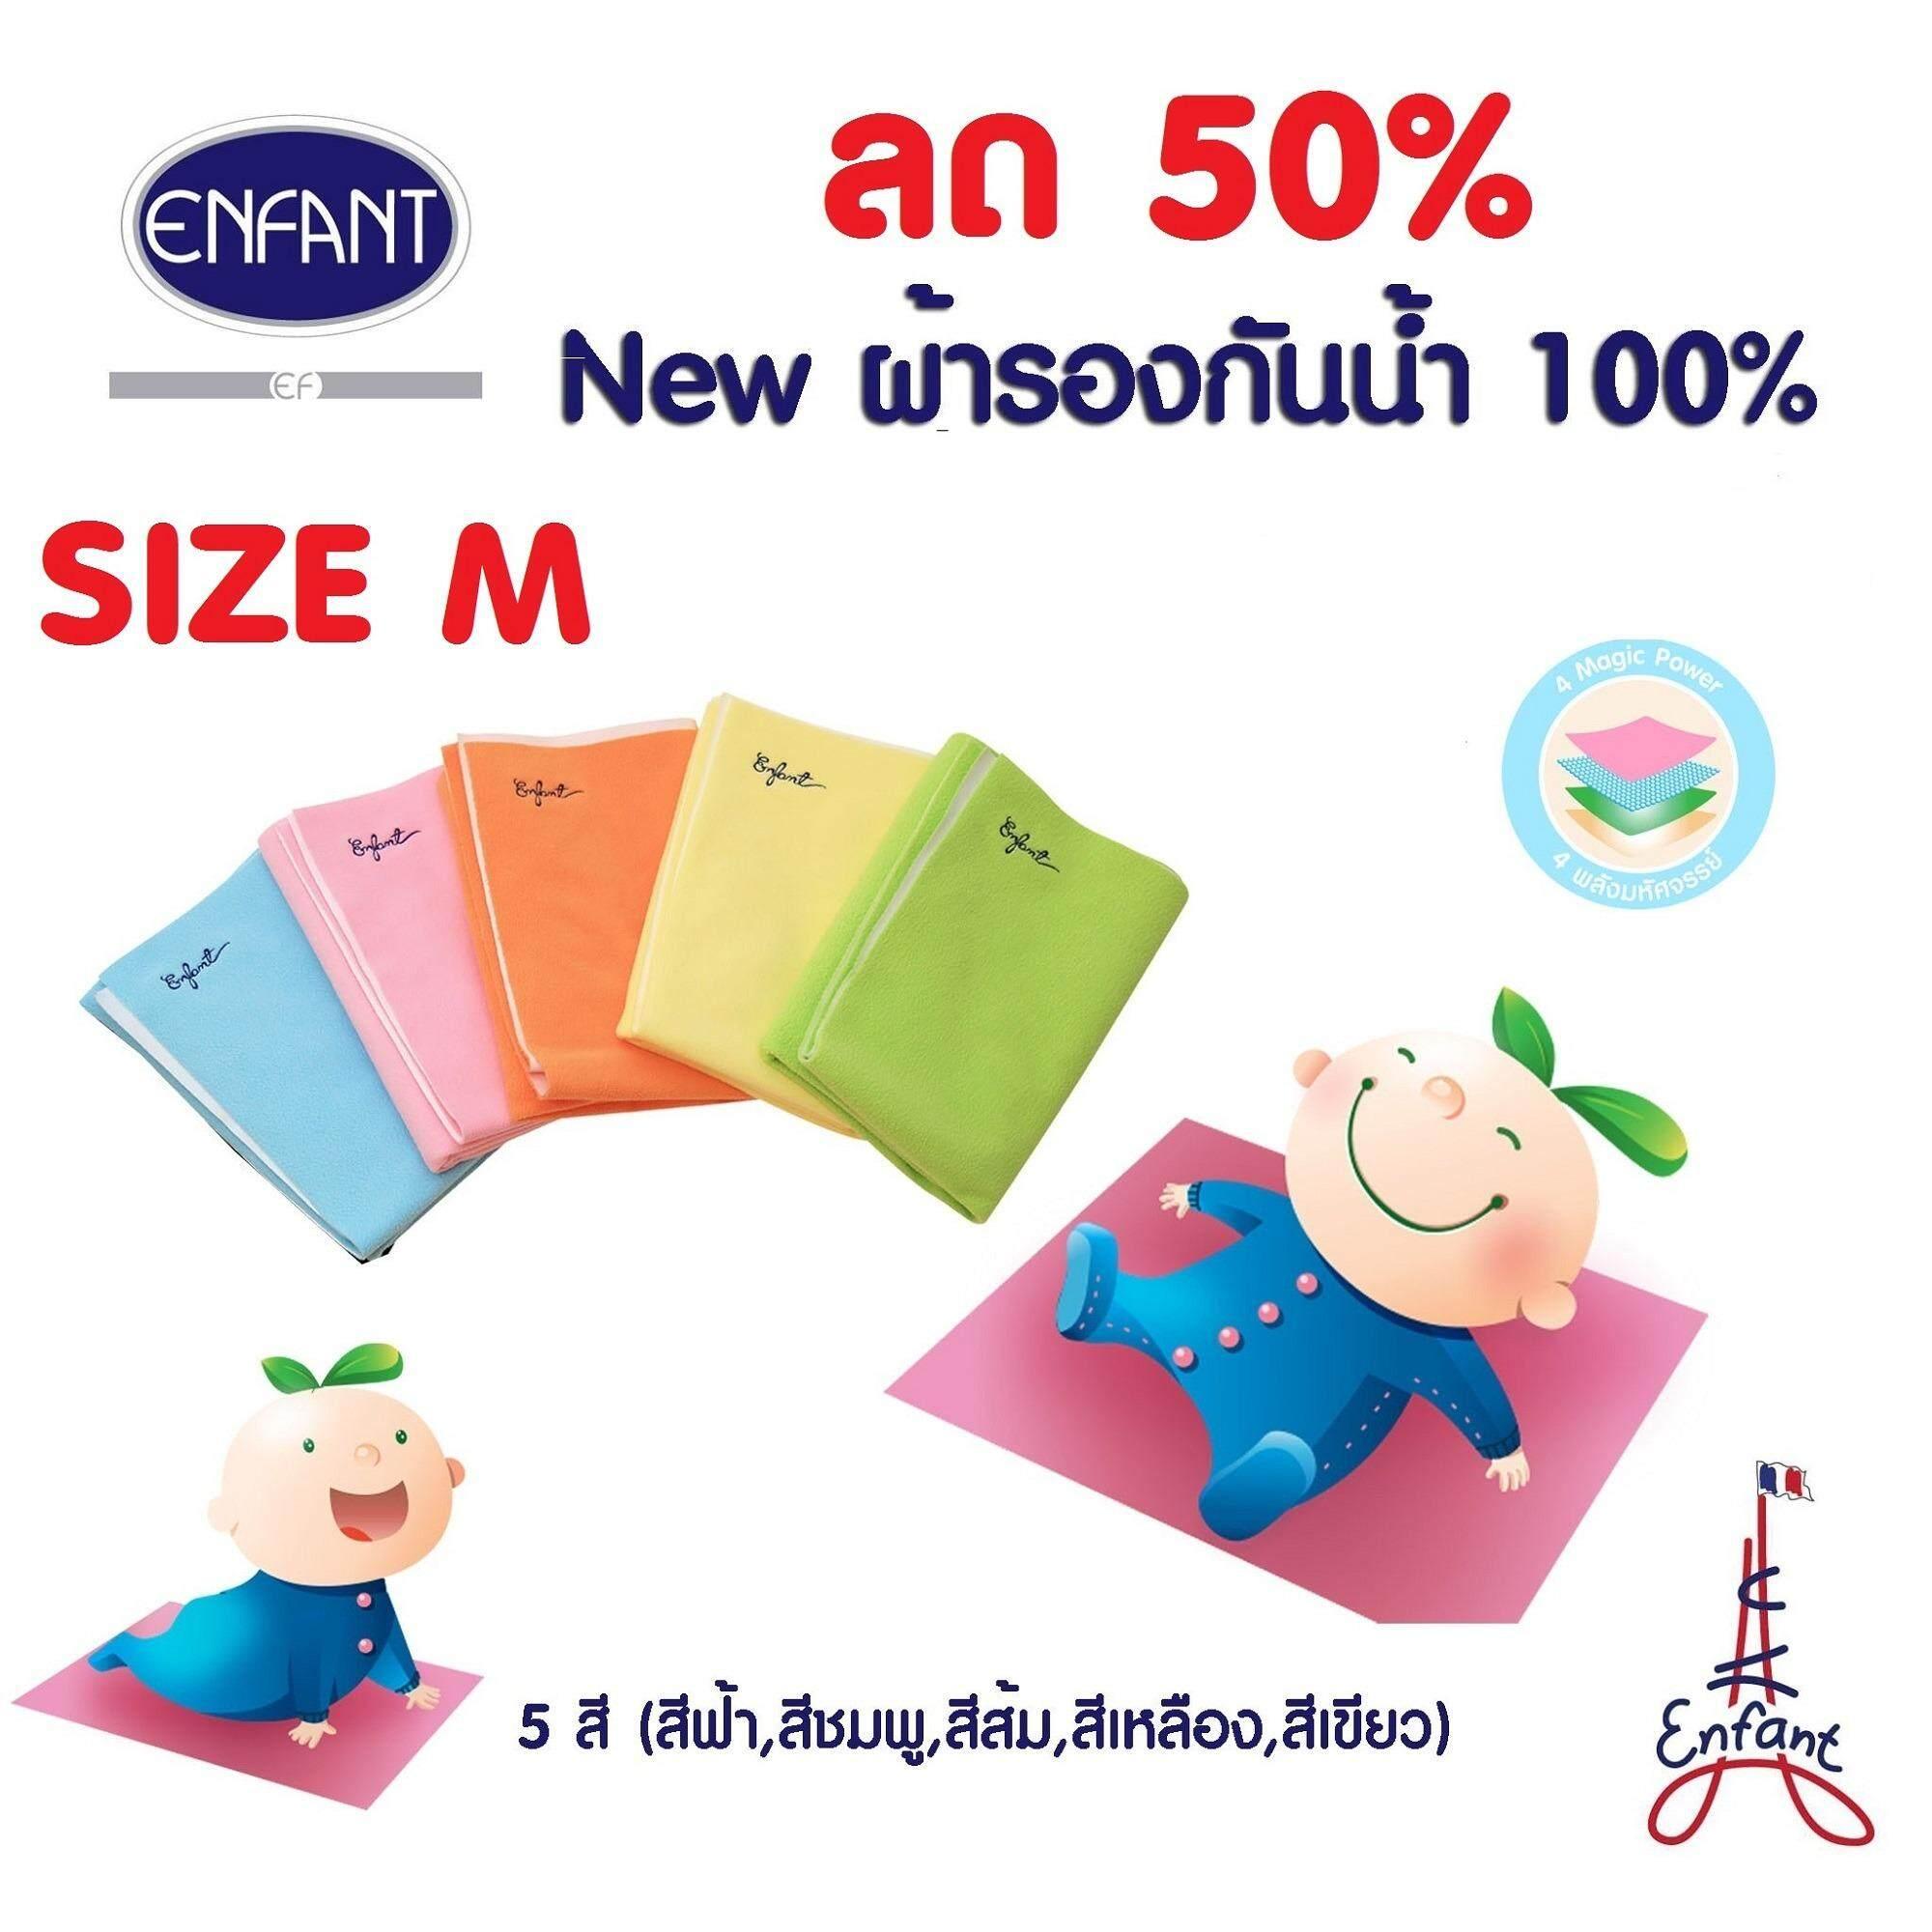 Enfant ผ้ารองกันน้ำ 100% SIZE M ขนาด 70 X 100 ซม.